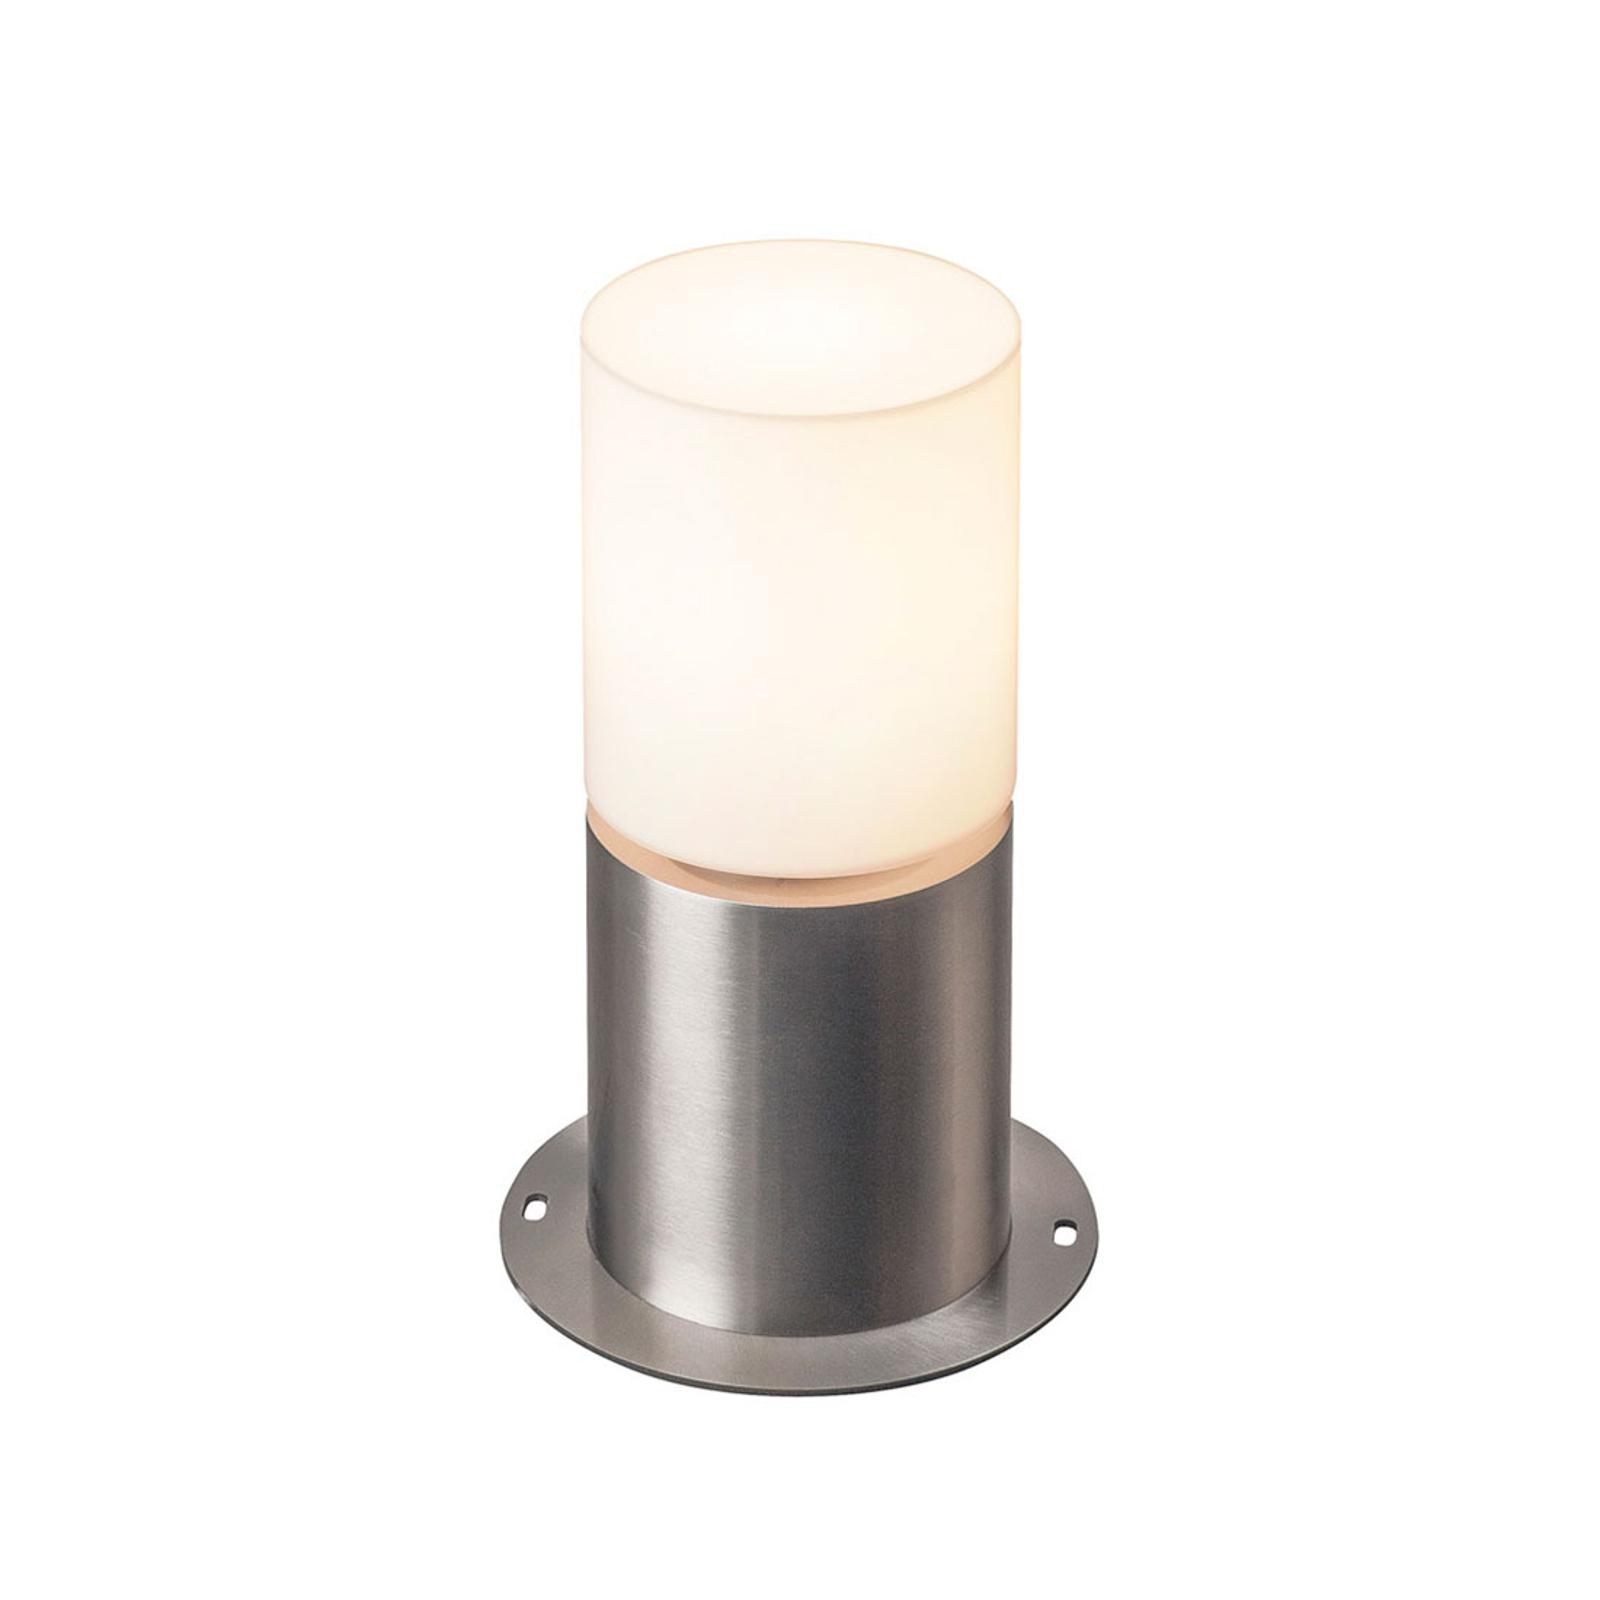 SLV Rox Acryl 30 LED-Sockelleuchte, Höhe 30 cm